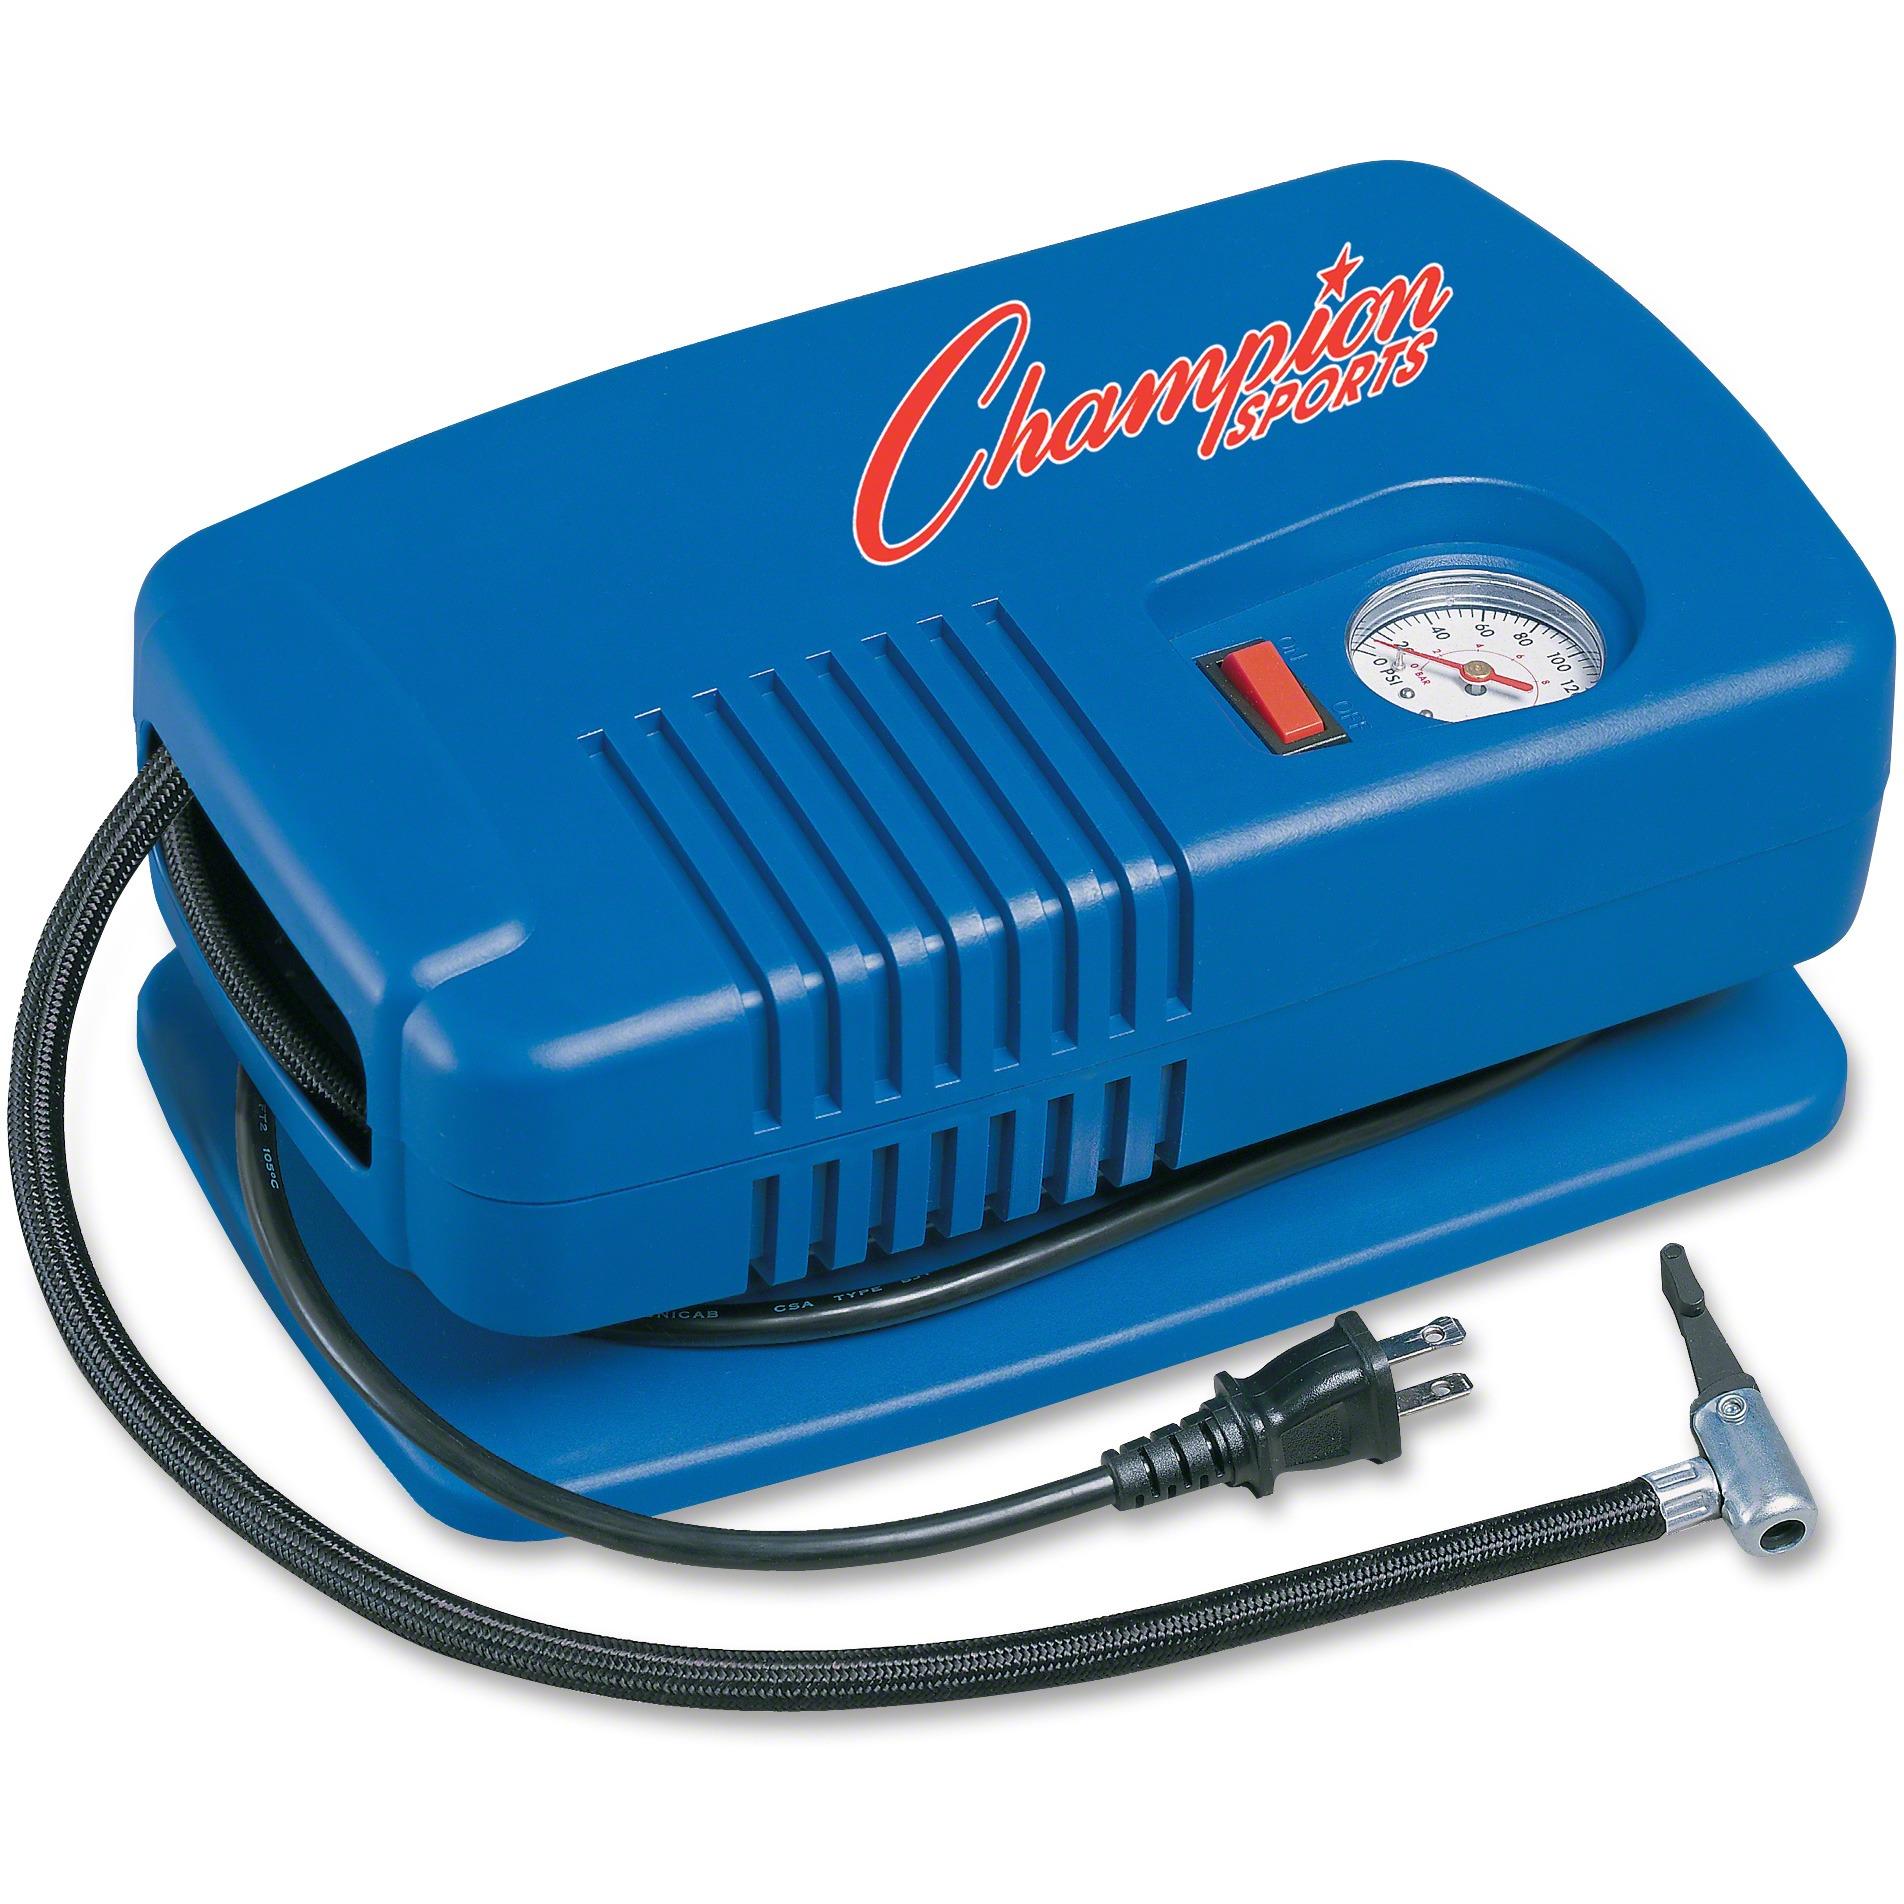 Champion Sport s Deluxe Equipment Inflating Pump